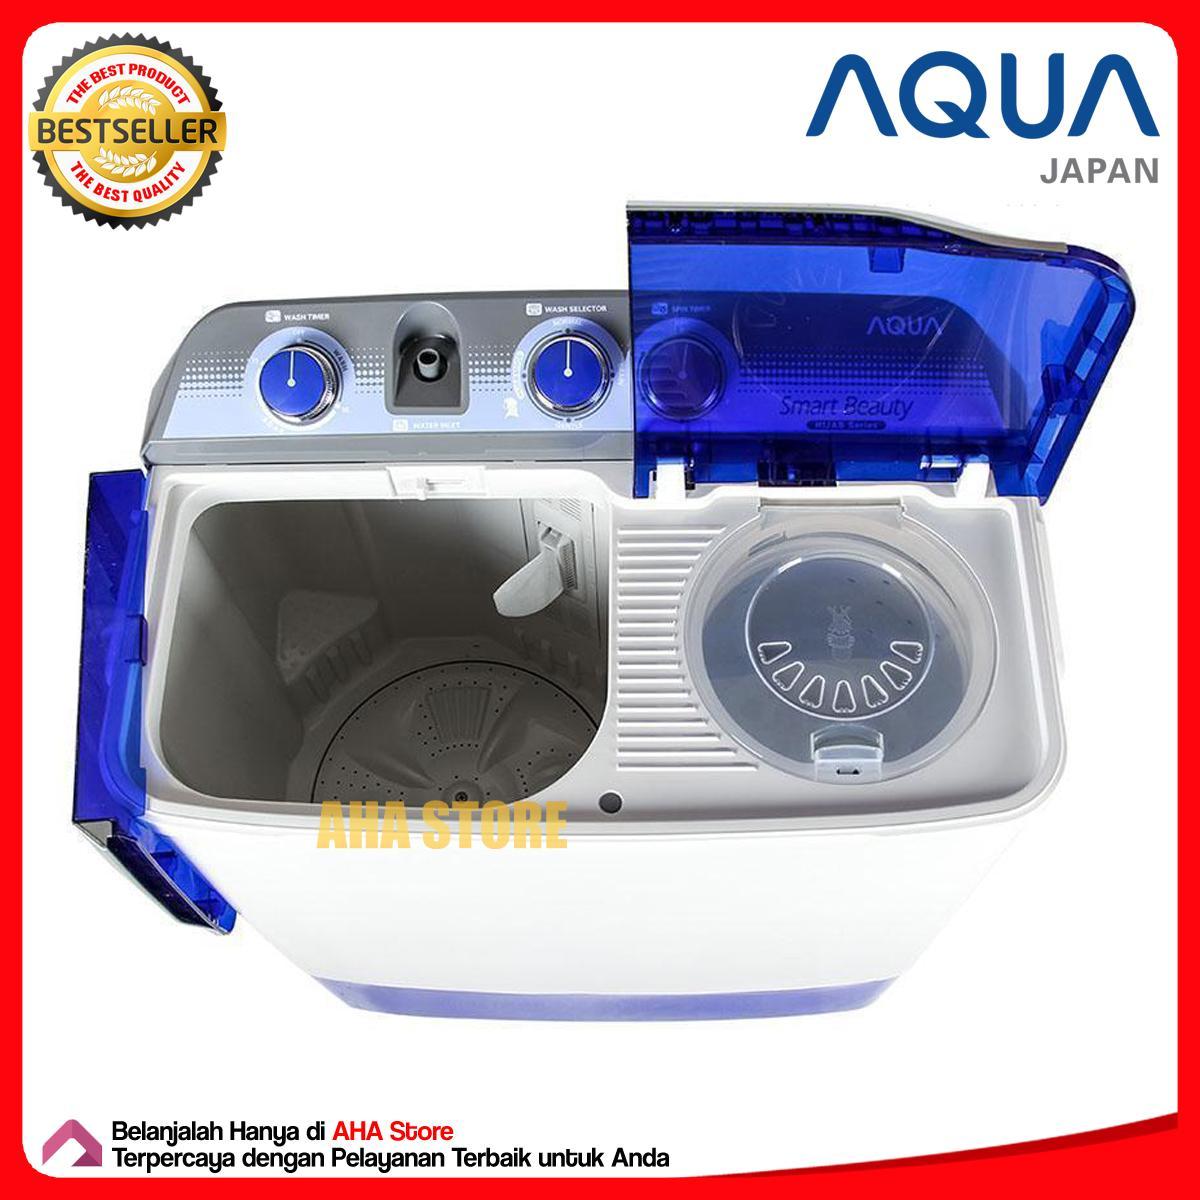 Aqua Mesin Cuci 2 Tabung Qw 770xt Khusus Jabodetabek Daftar Harga 12 Kg 1280xt Free Ongkir Area 8 880xt